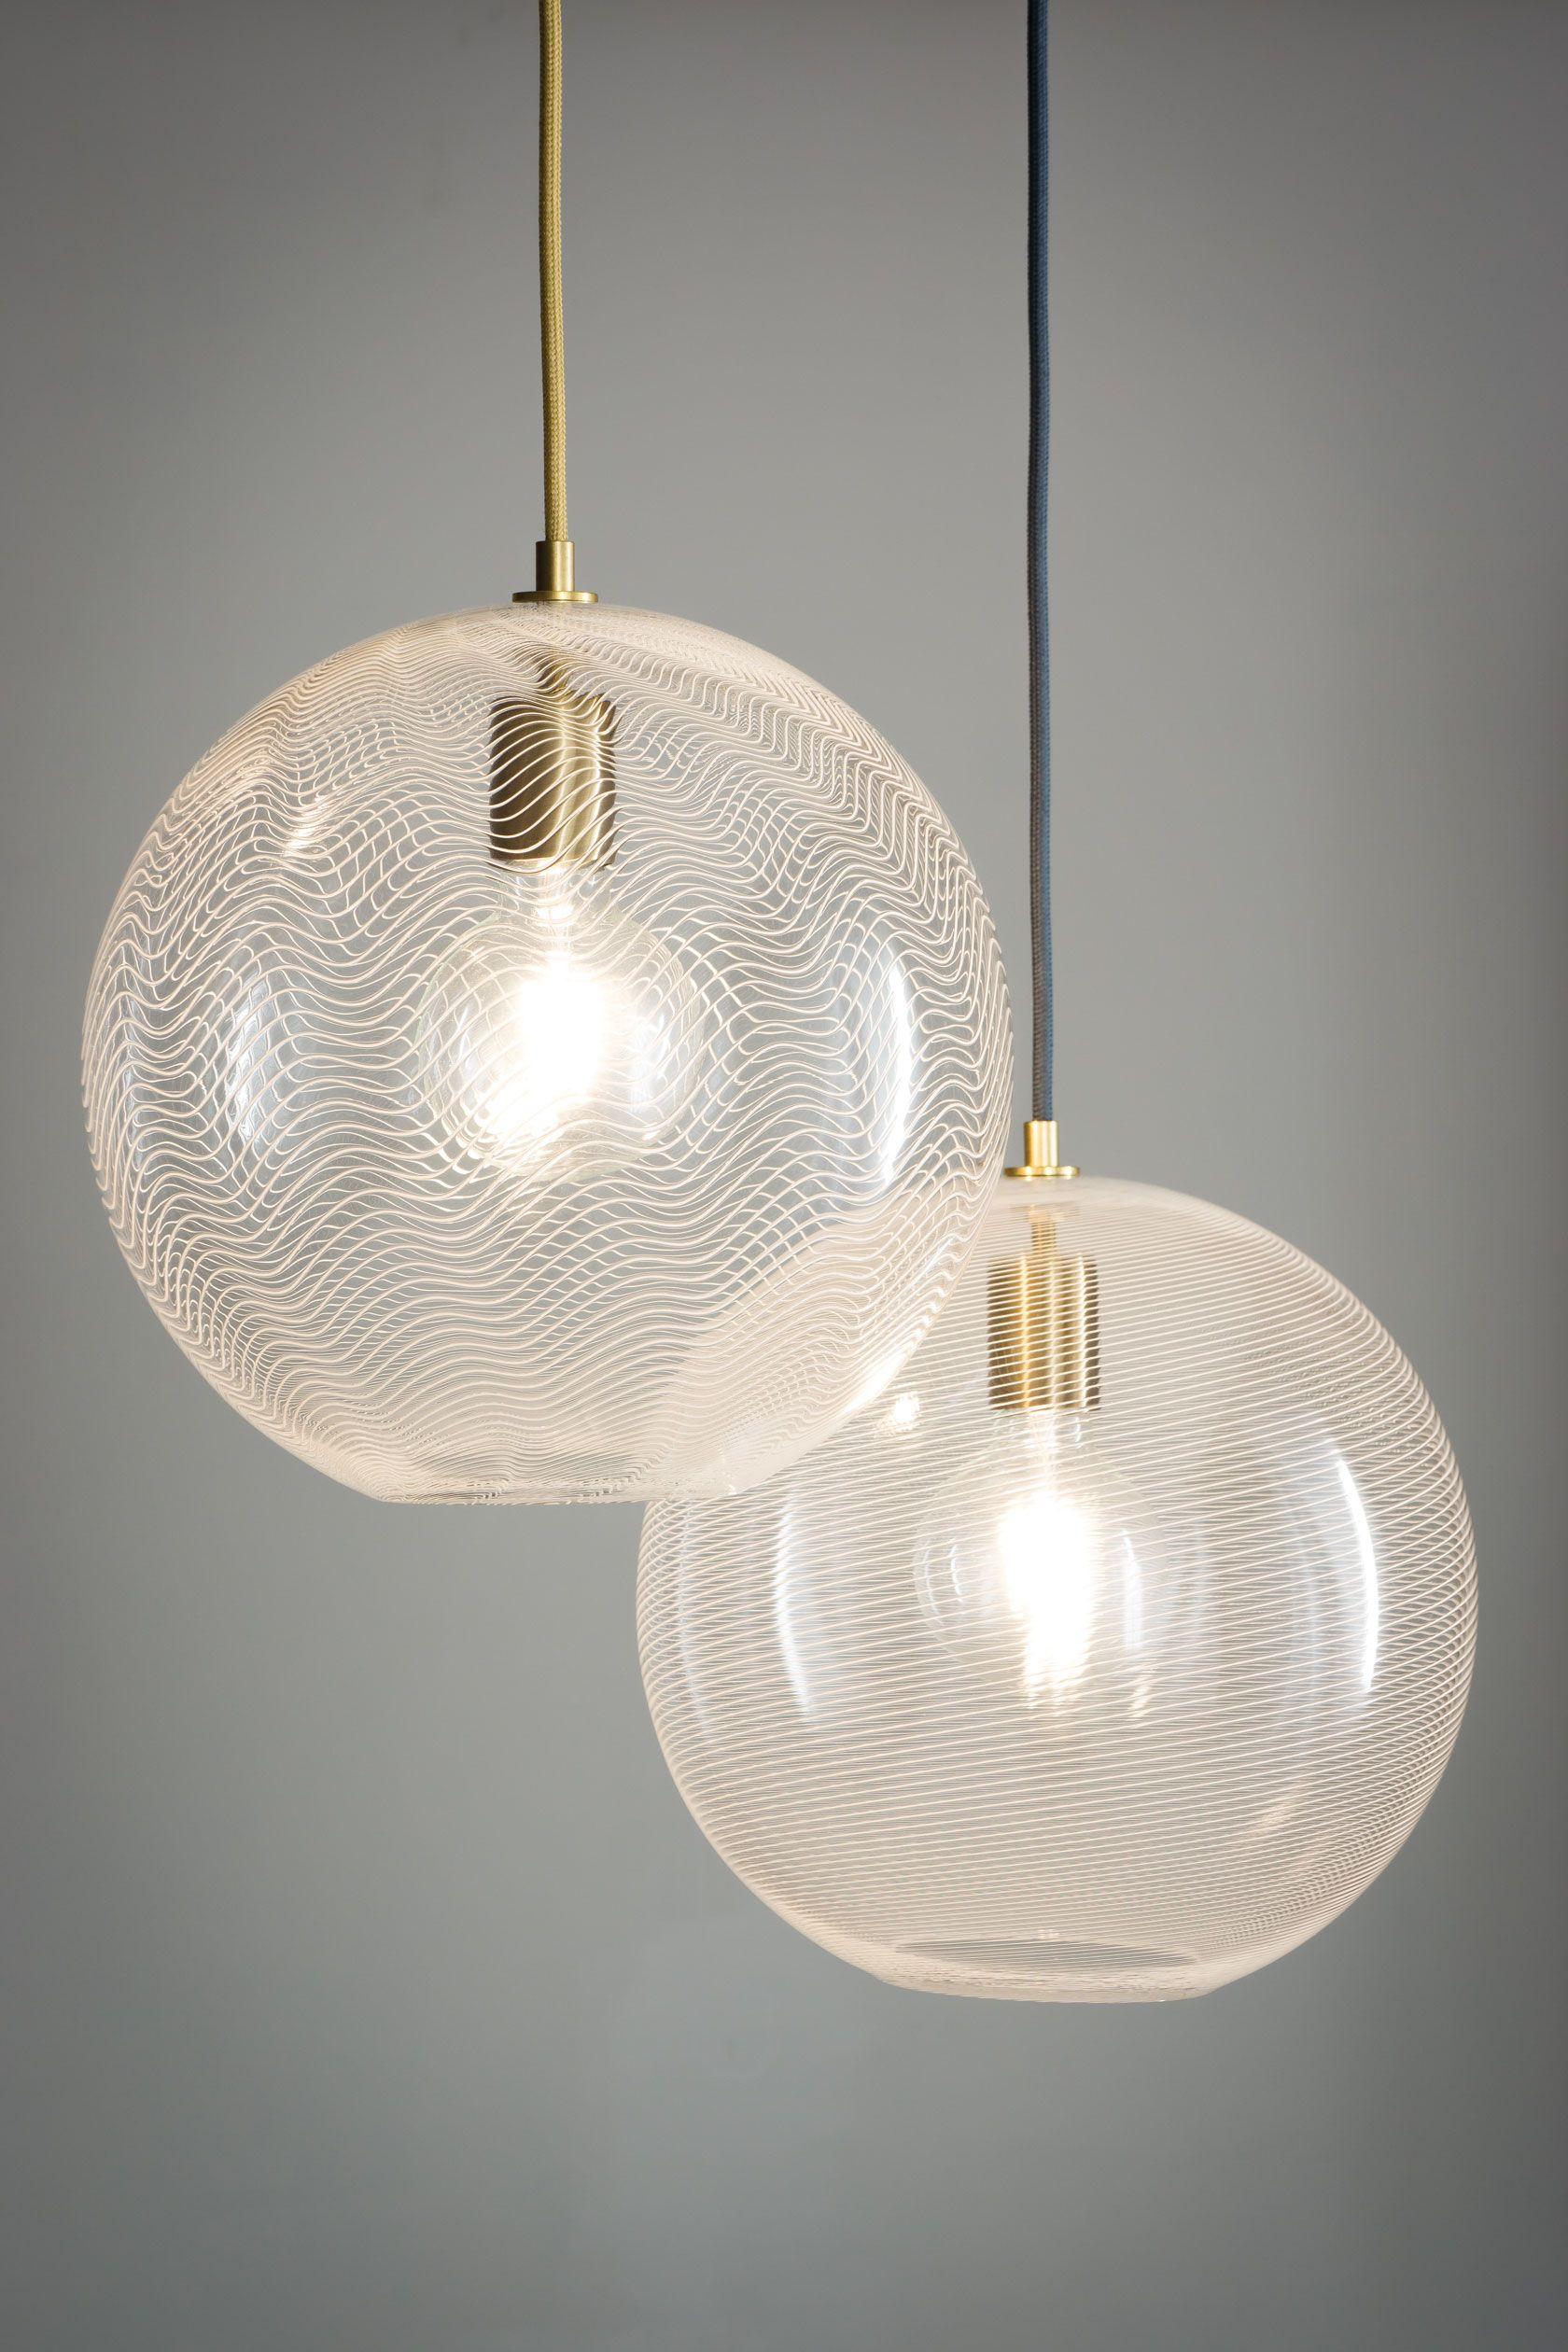 globe pendant lighting. Cane Pendant Light By KEEP Globe Lighting